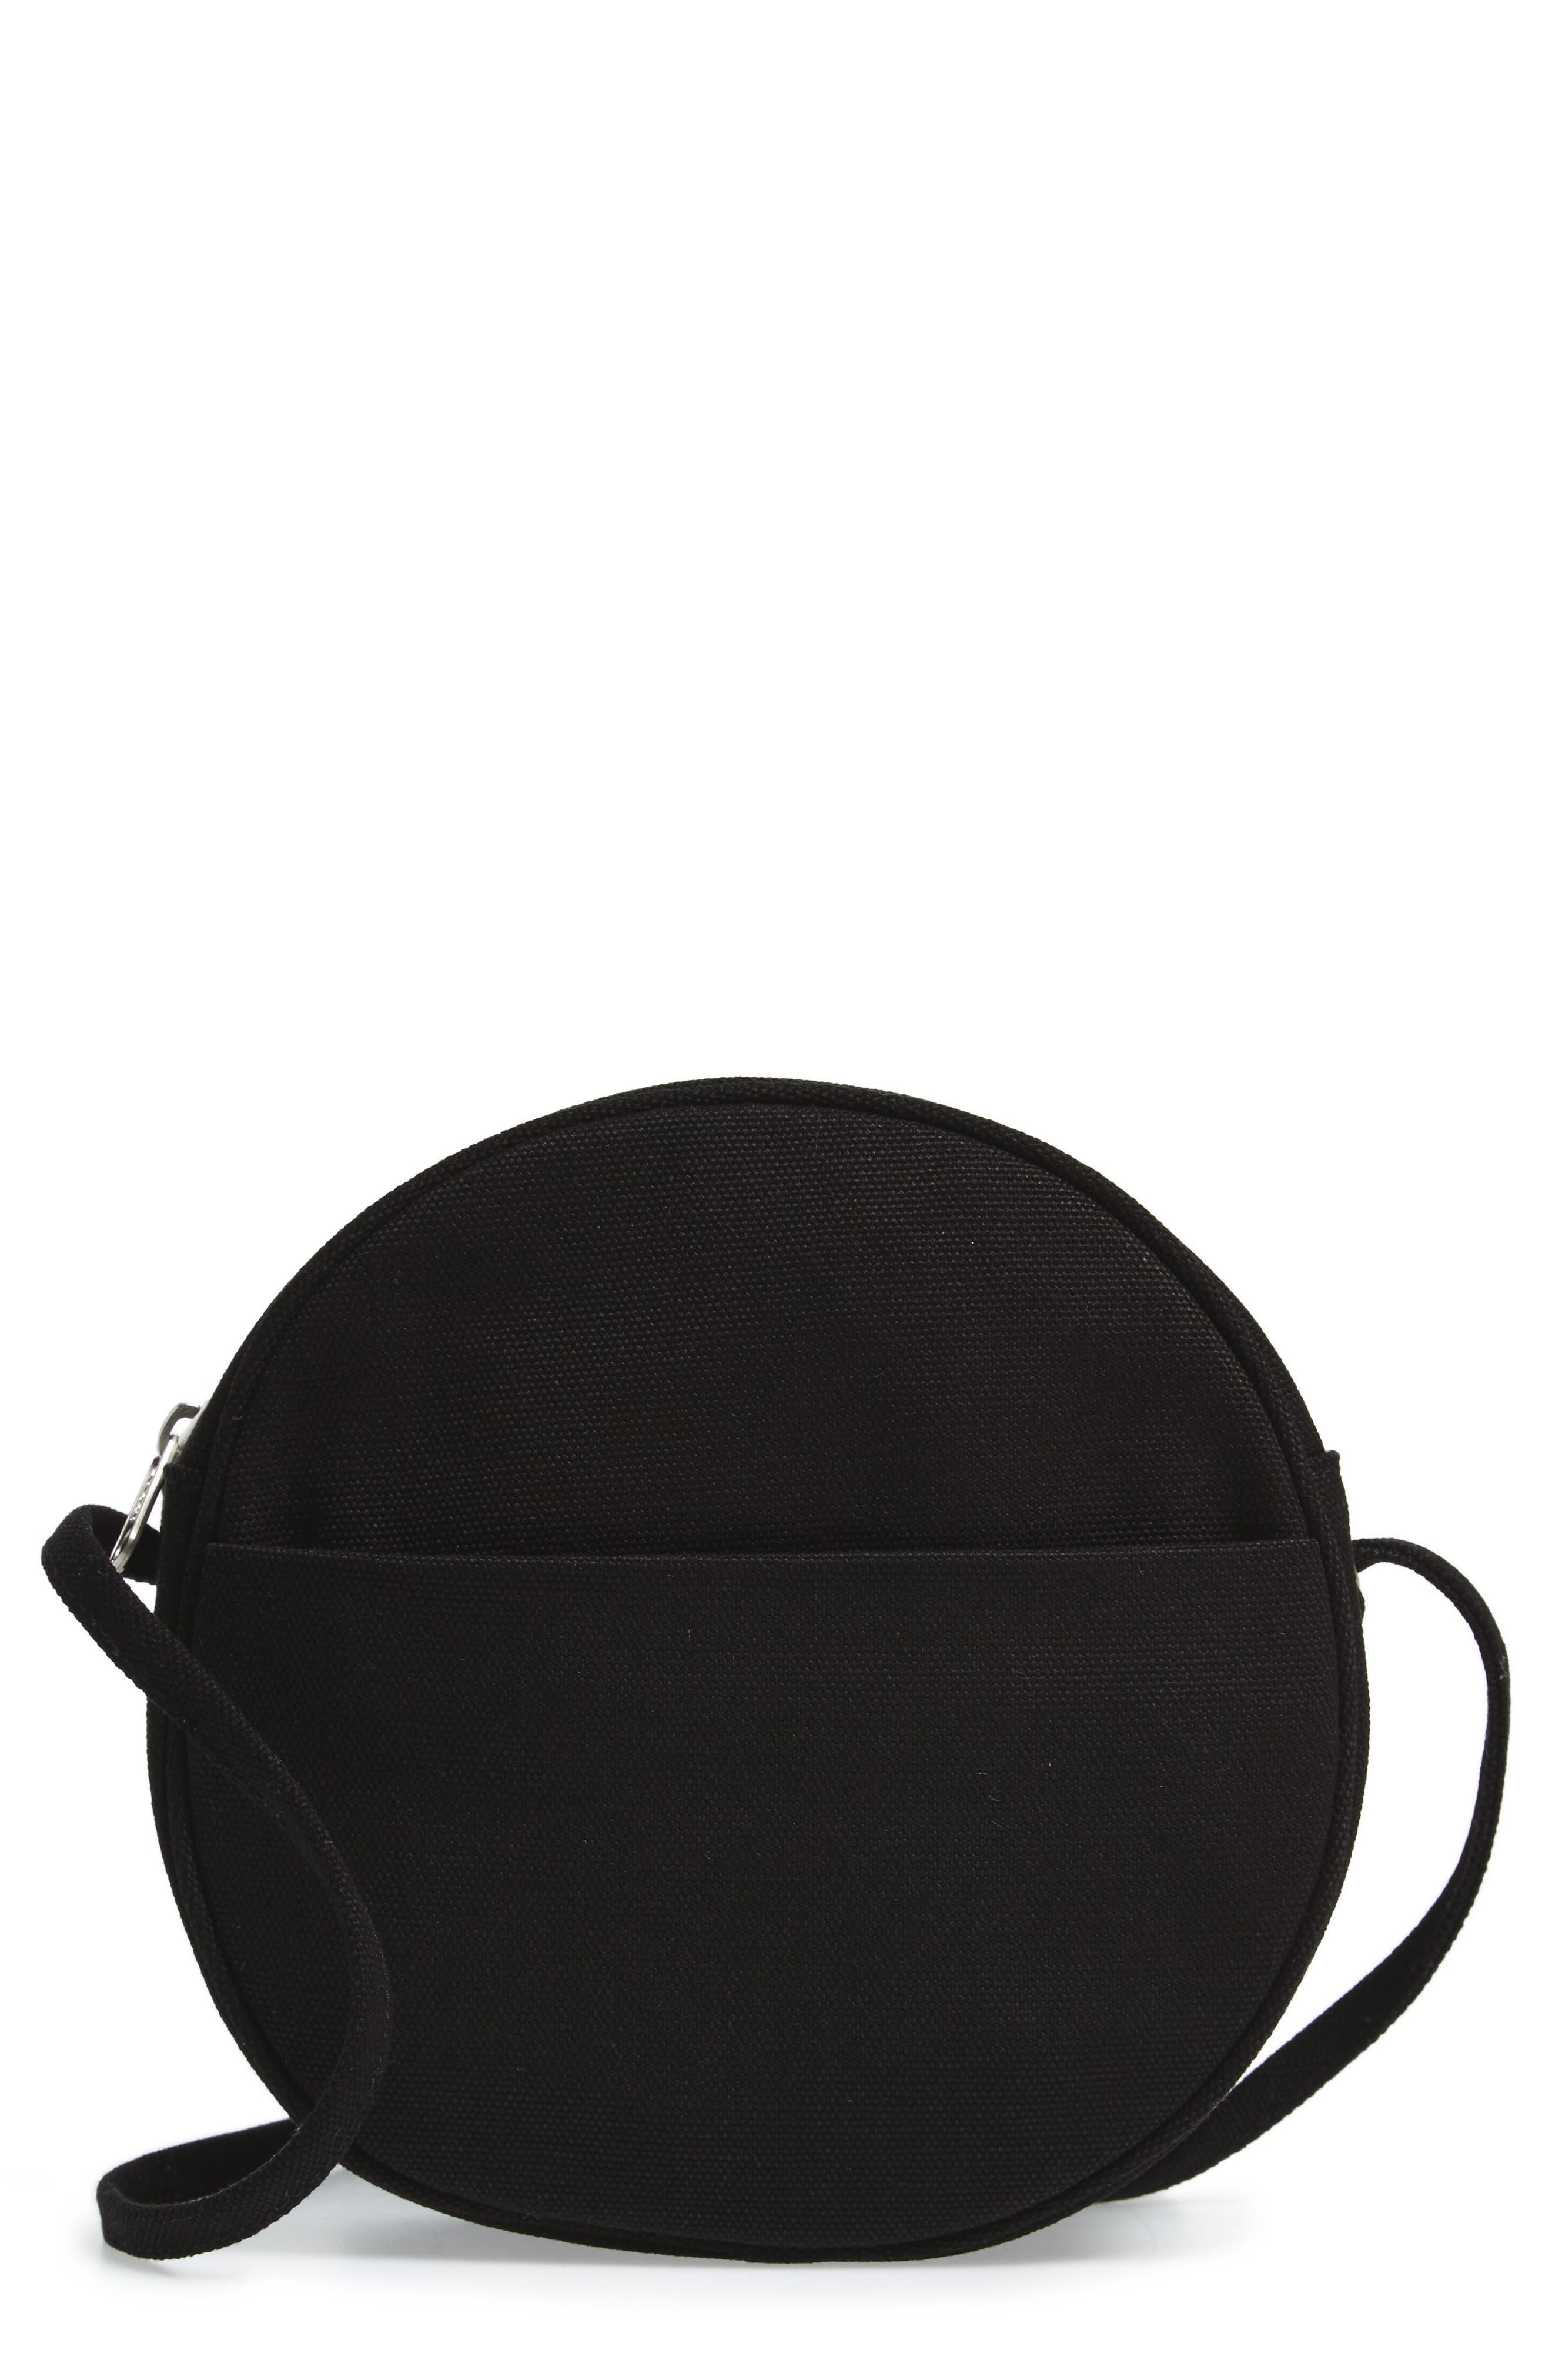 Small Canvas Shoulder Bag,                             Main thumbnail 1, color,                             001